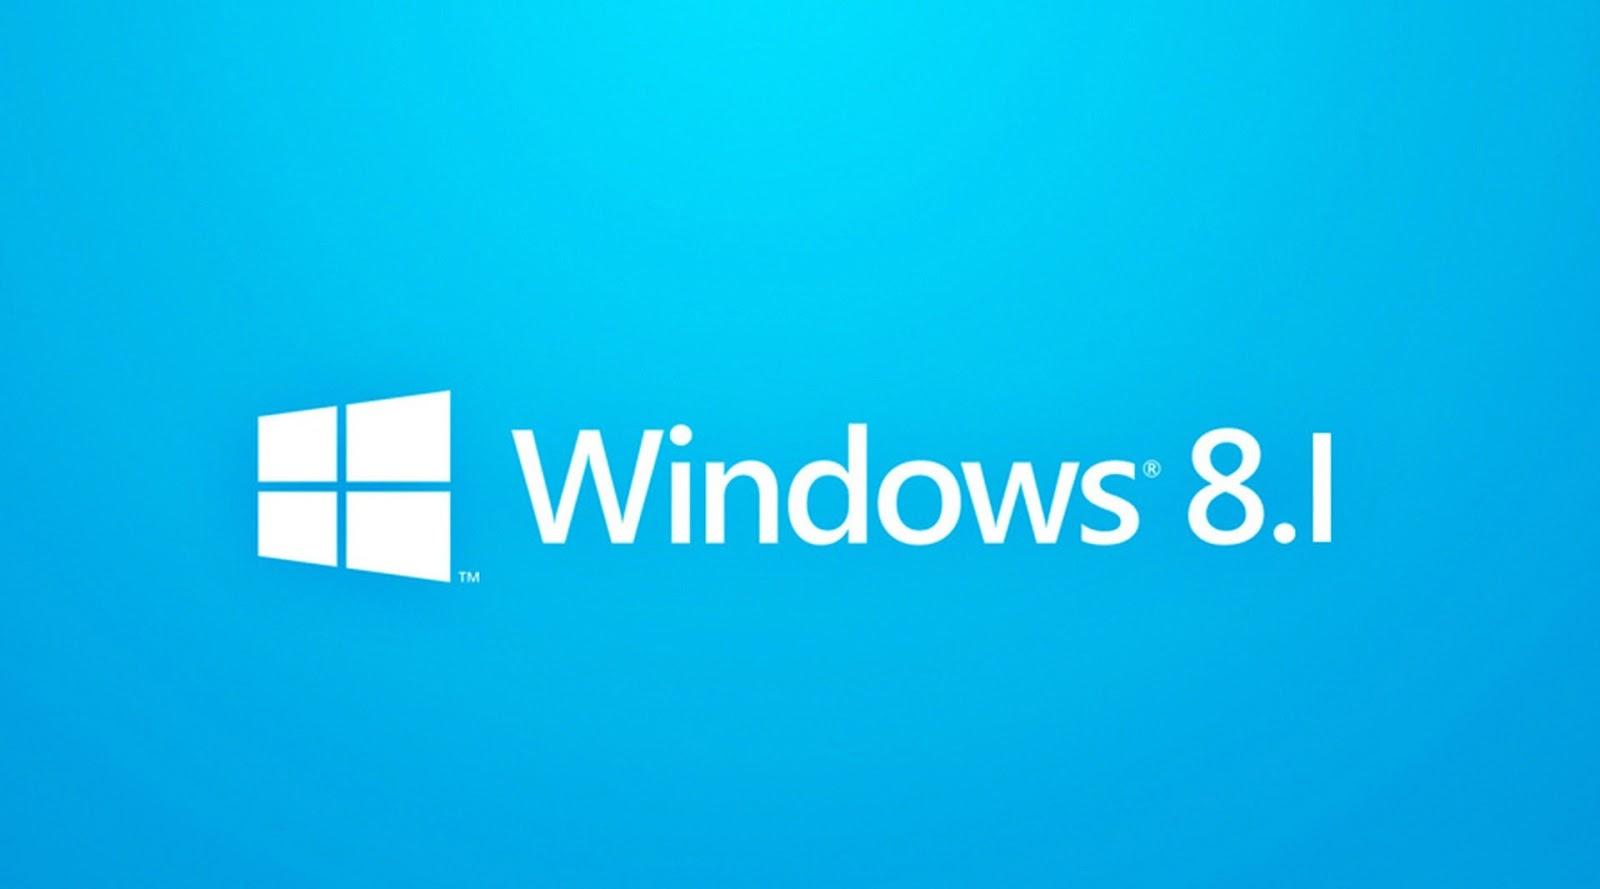 Windows 8 1 pro windows 10 x86x64 bit - Windows 8 1 Aio With Update X86 X64